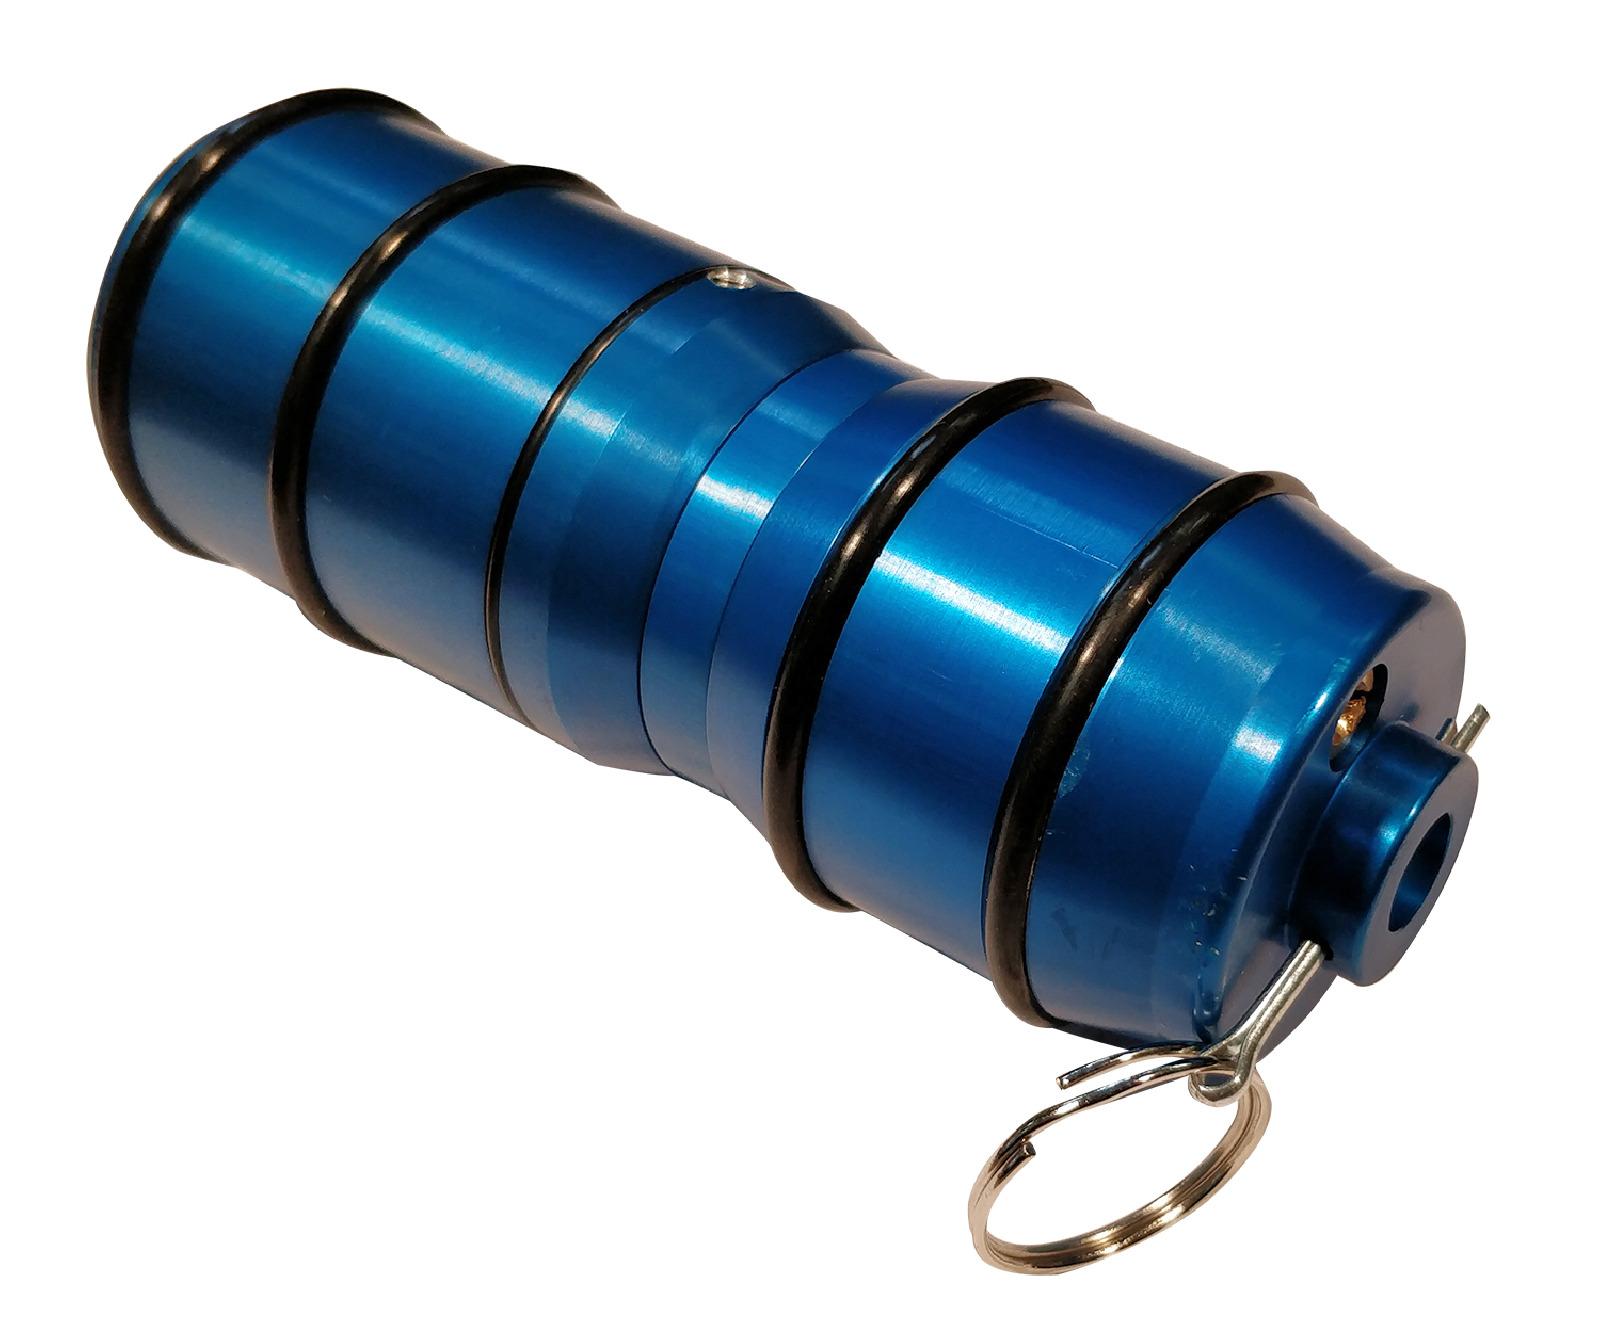 Cybergun Typhoon Grenade Aluminum Bleu product image